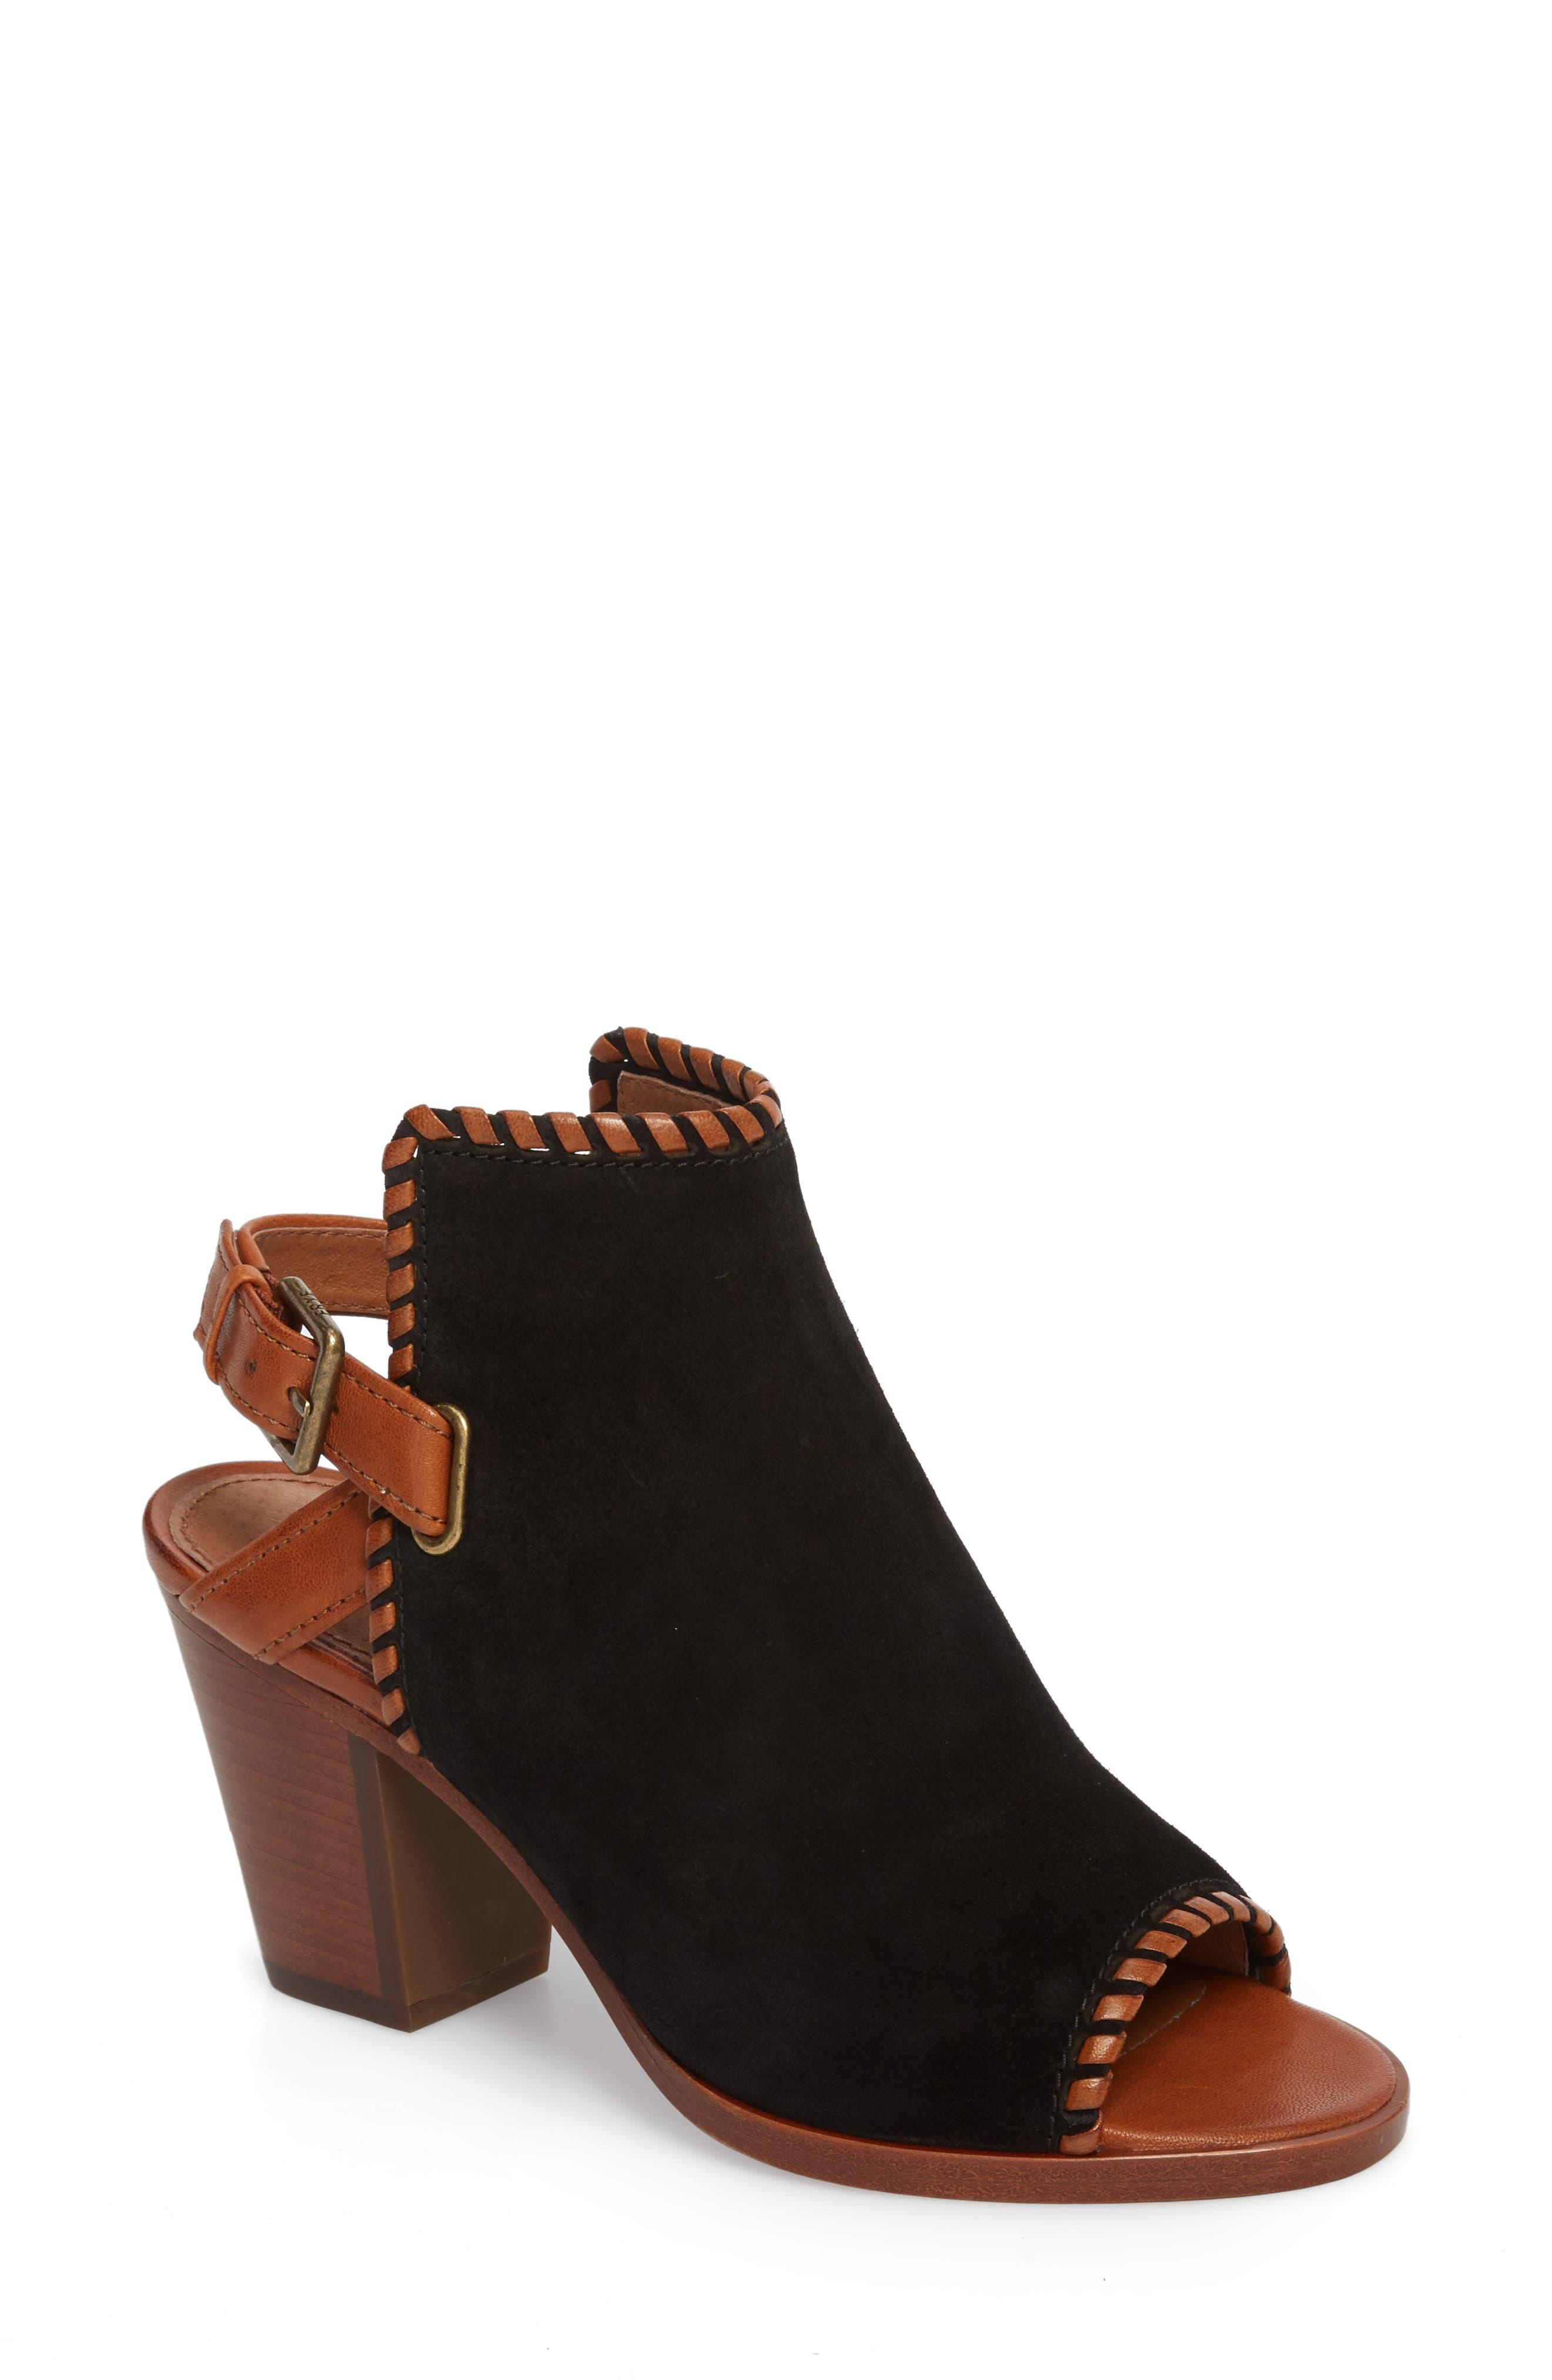 Dani Shield Sandal,                         Main,                         color,